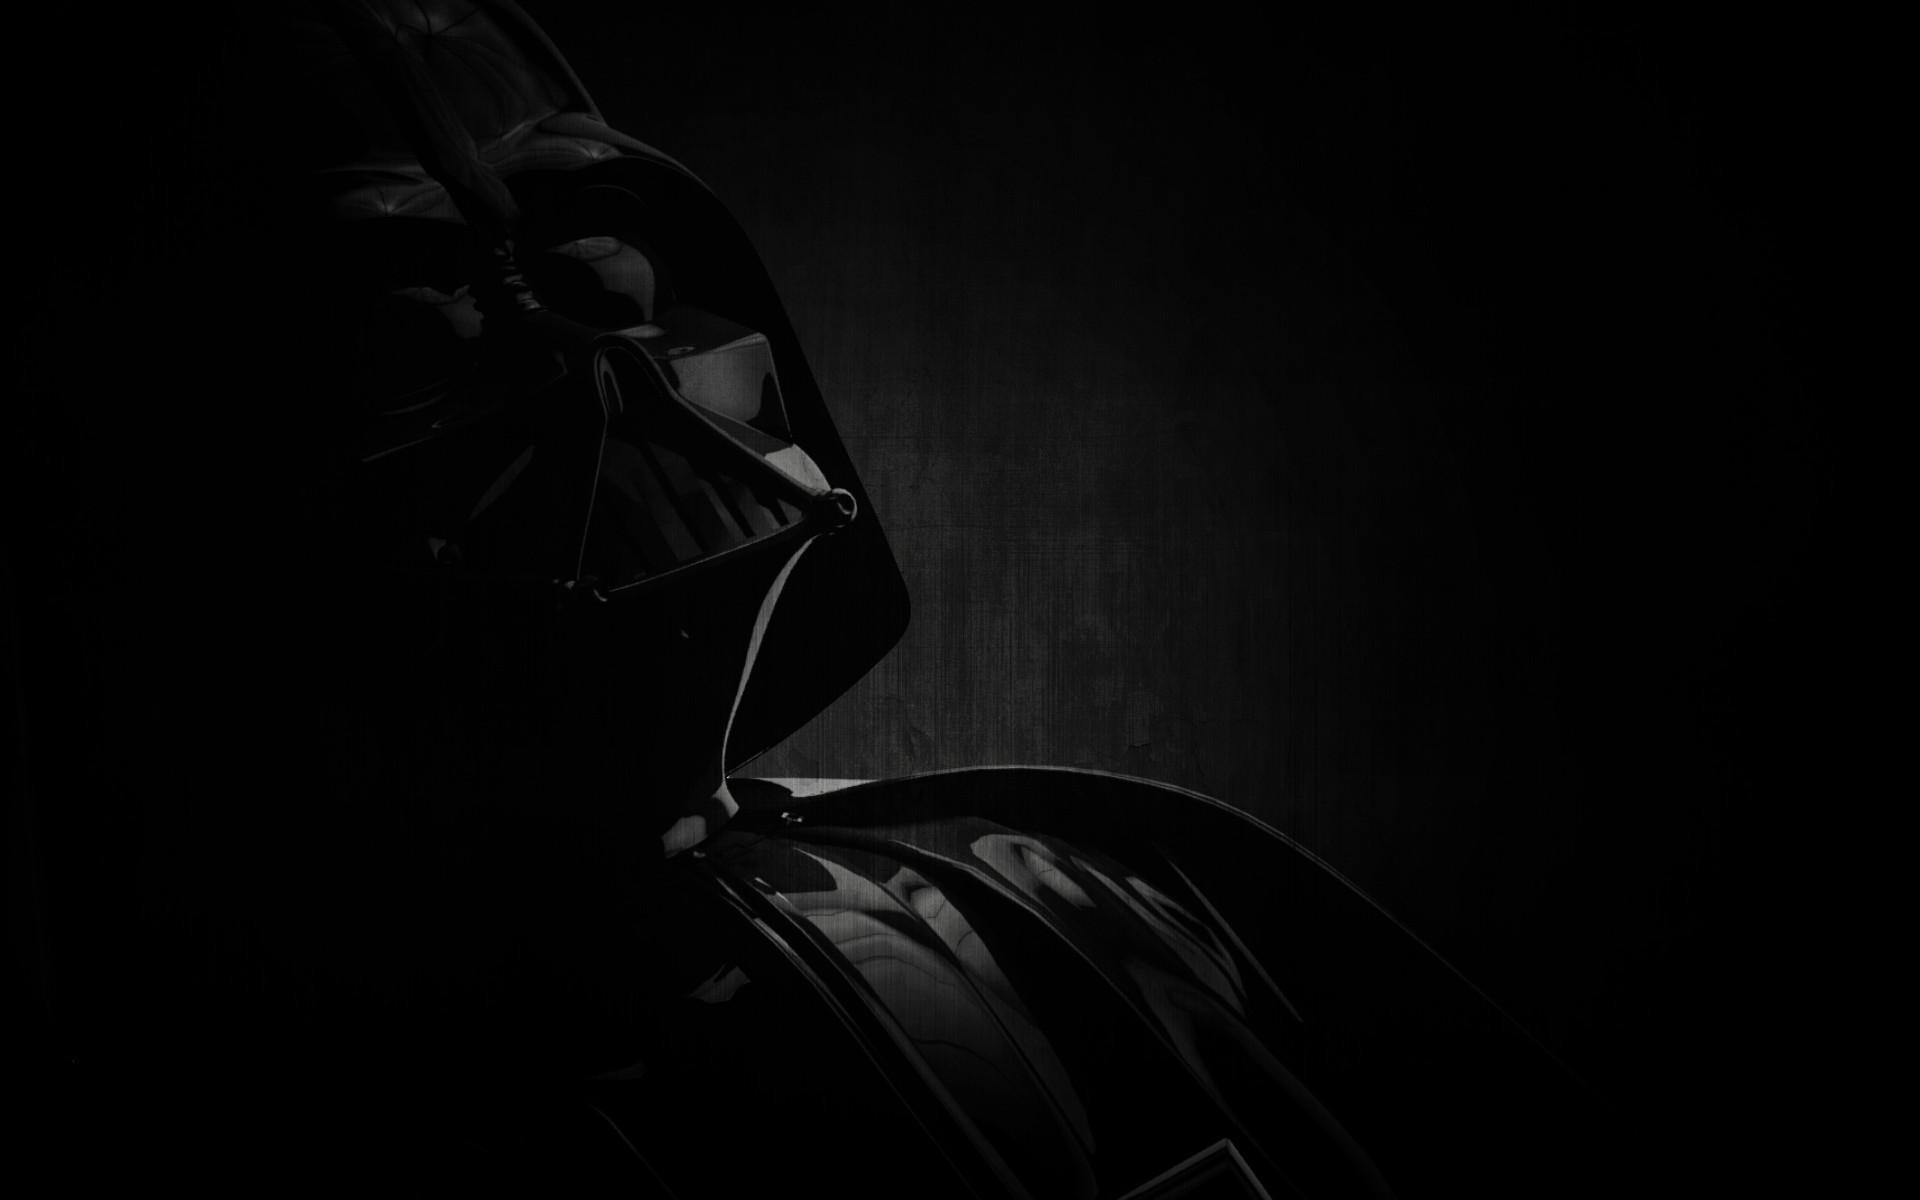 Star Wars Dark Art Shadow Monochrome Silhouette Studio Light Anakin Skywalker Wallpapers Saga